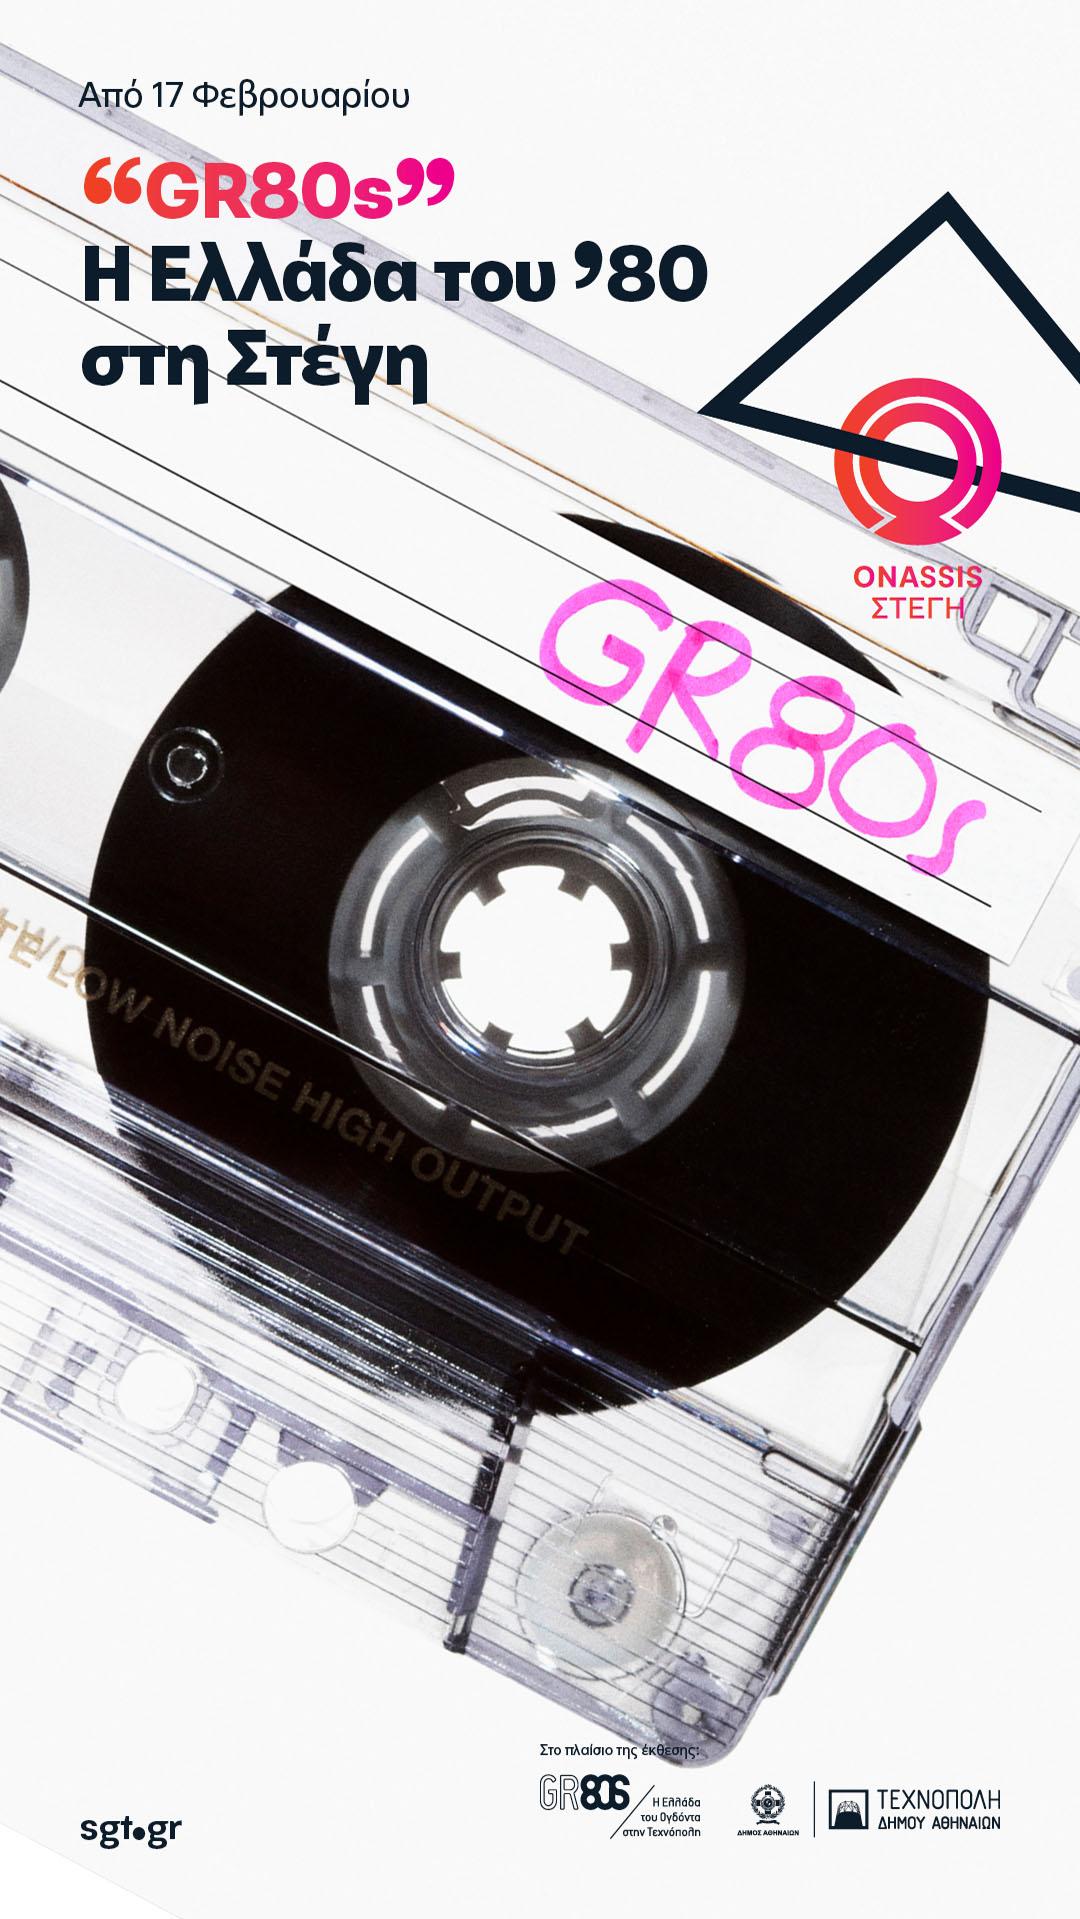 gr80s cassete